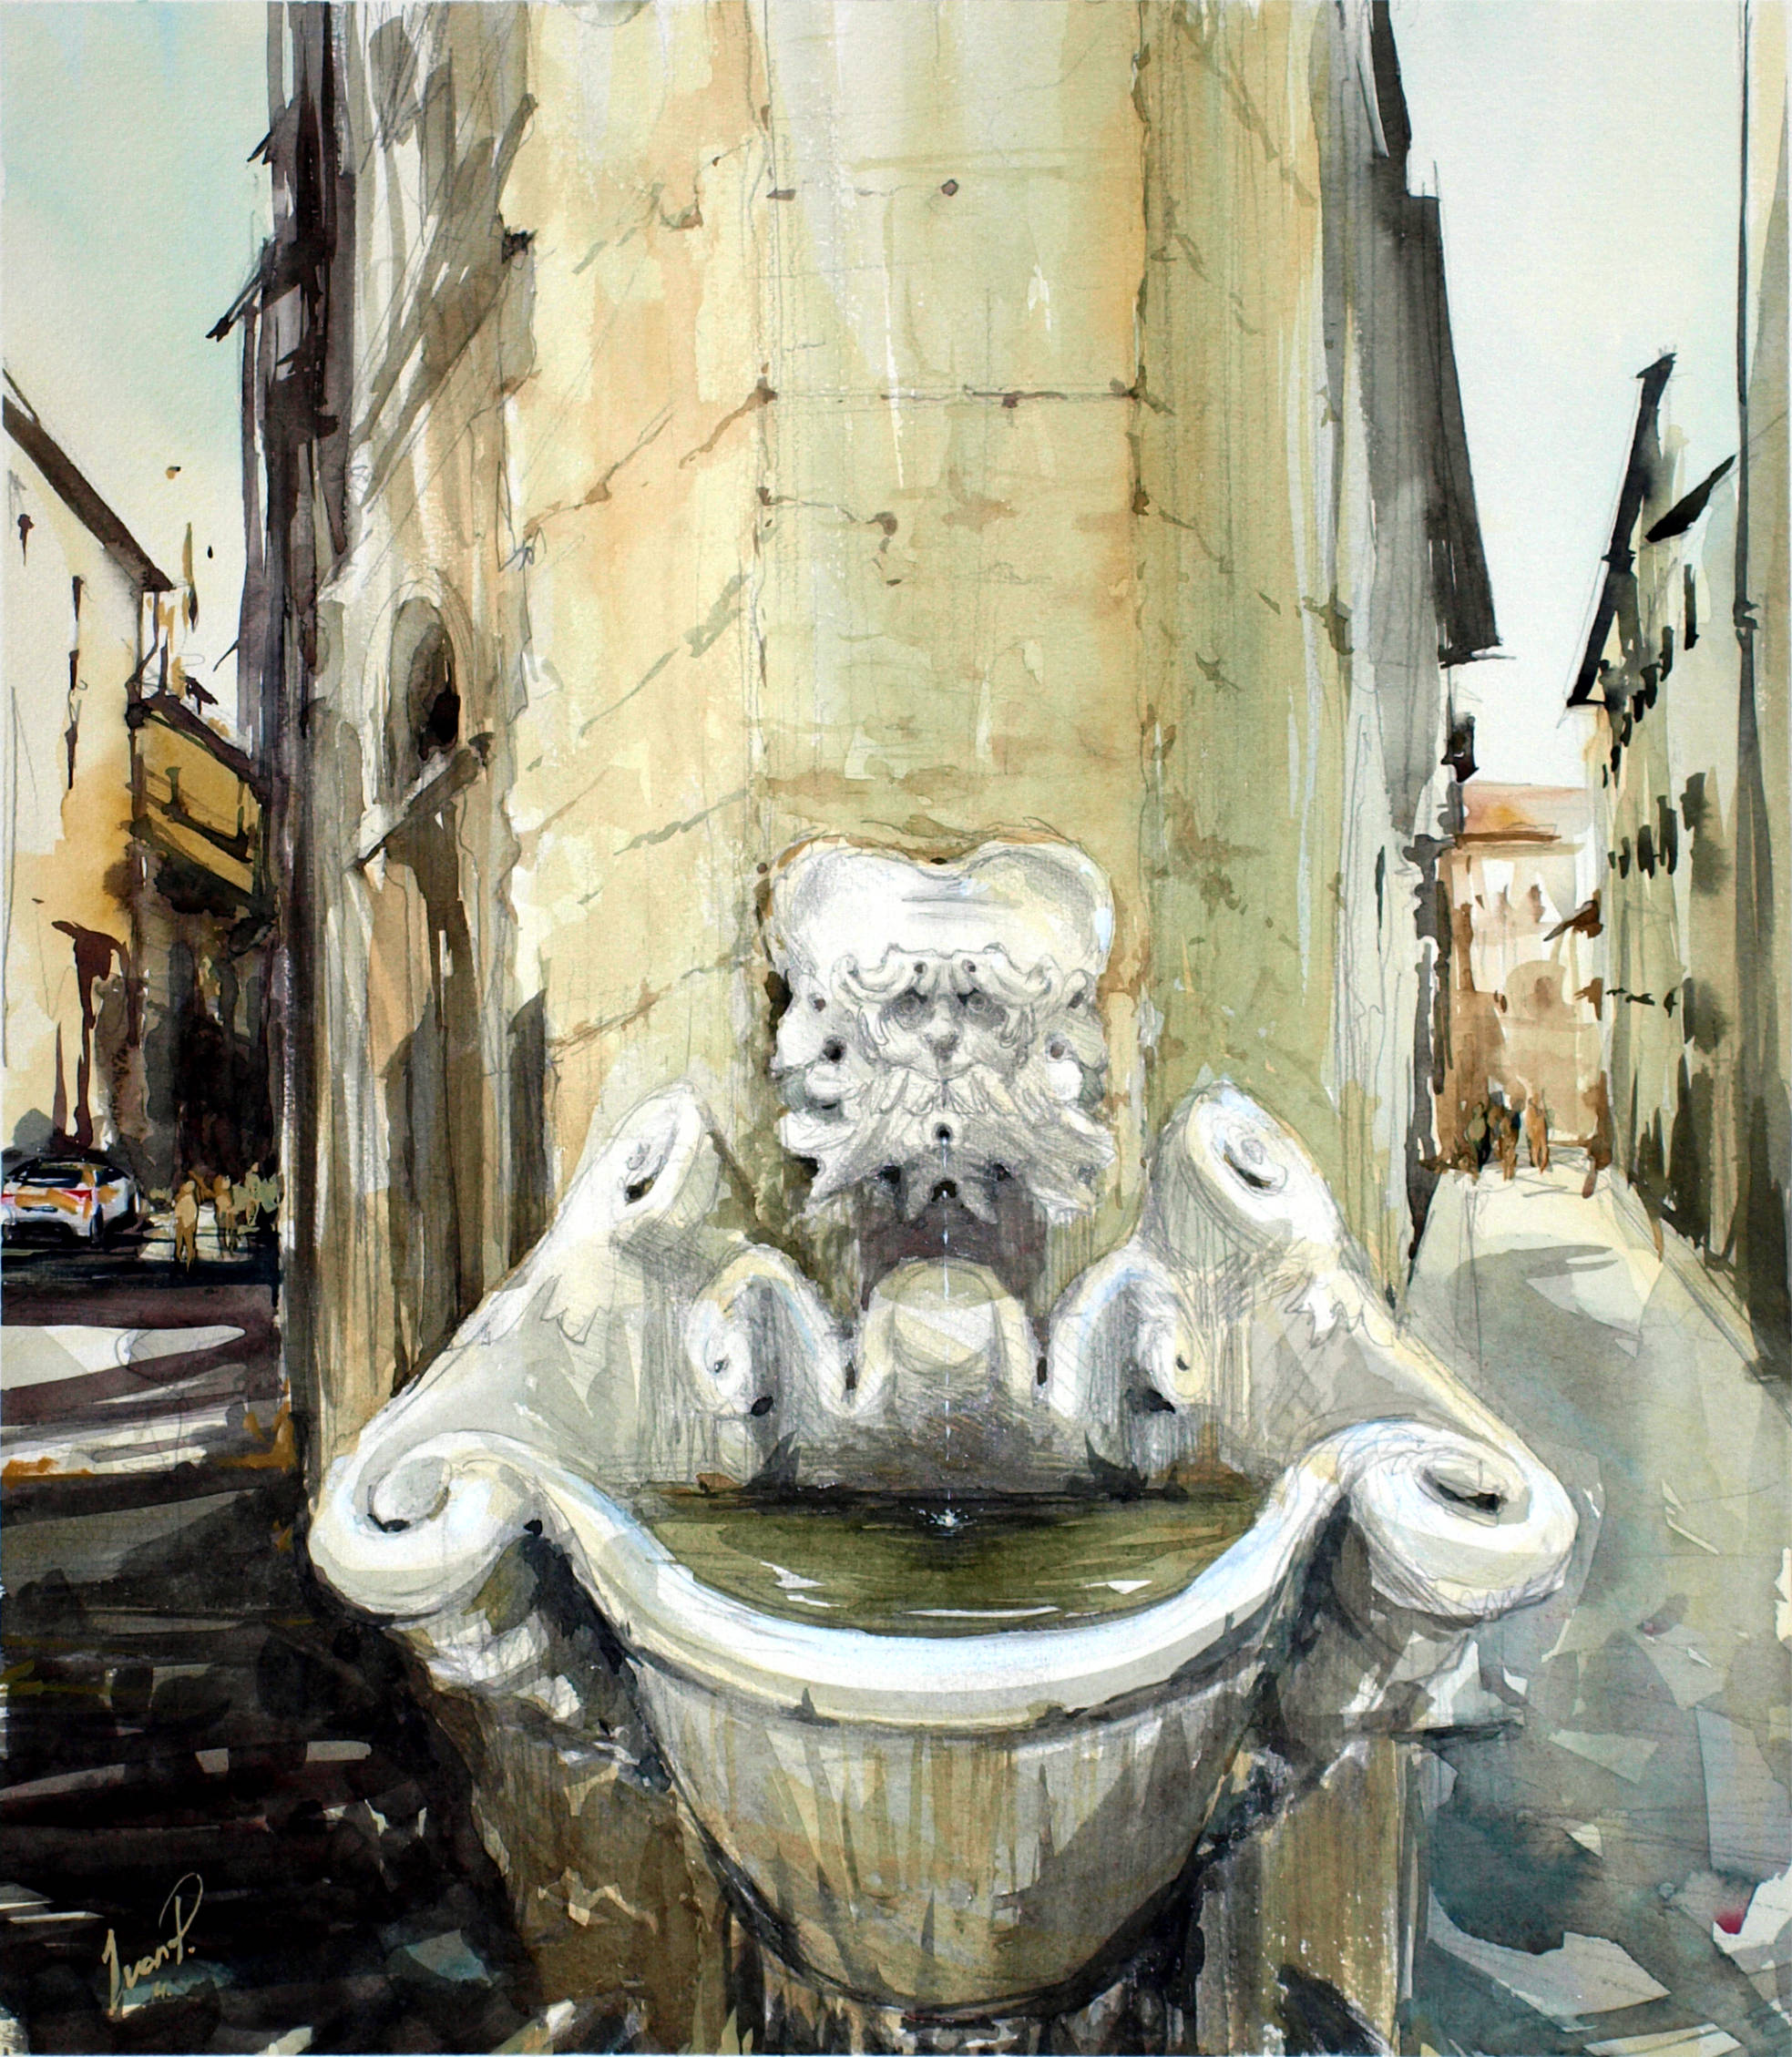 Sprone fountain/Фонтан Спроун